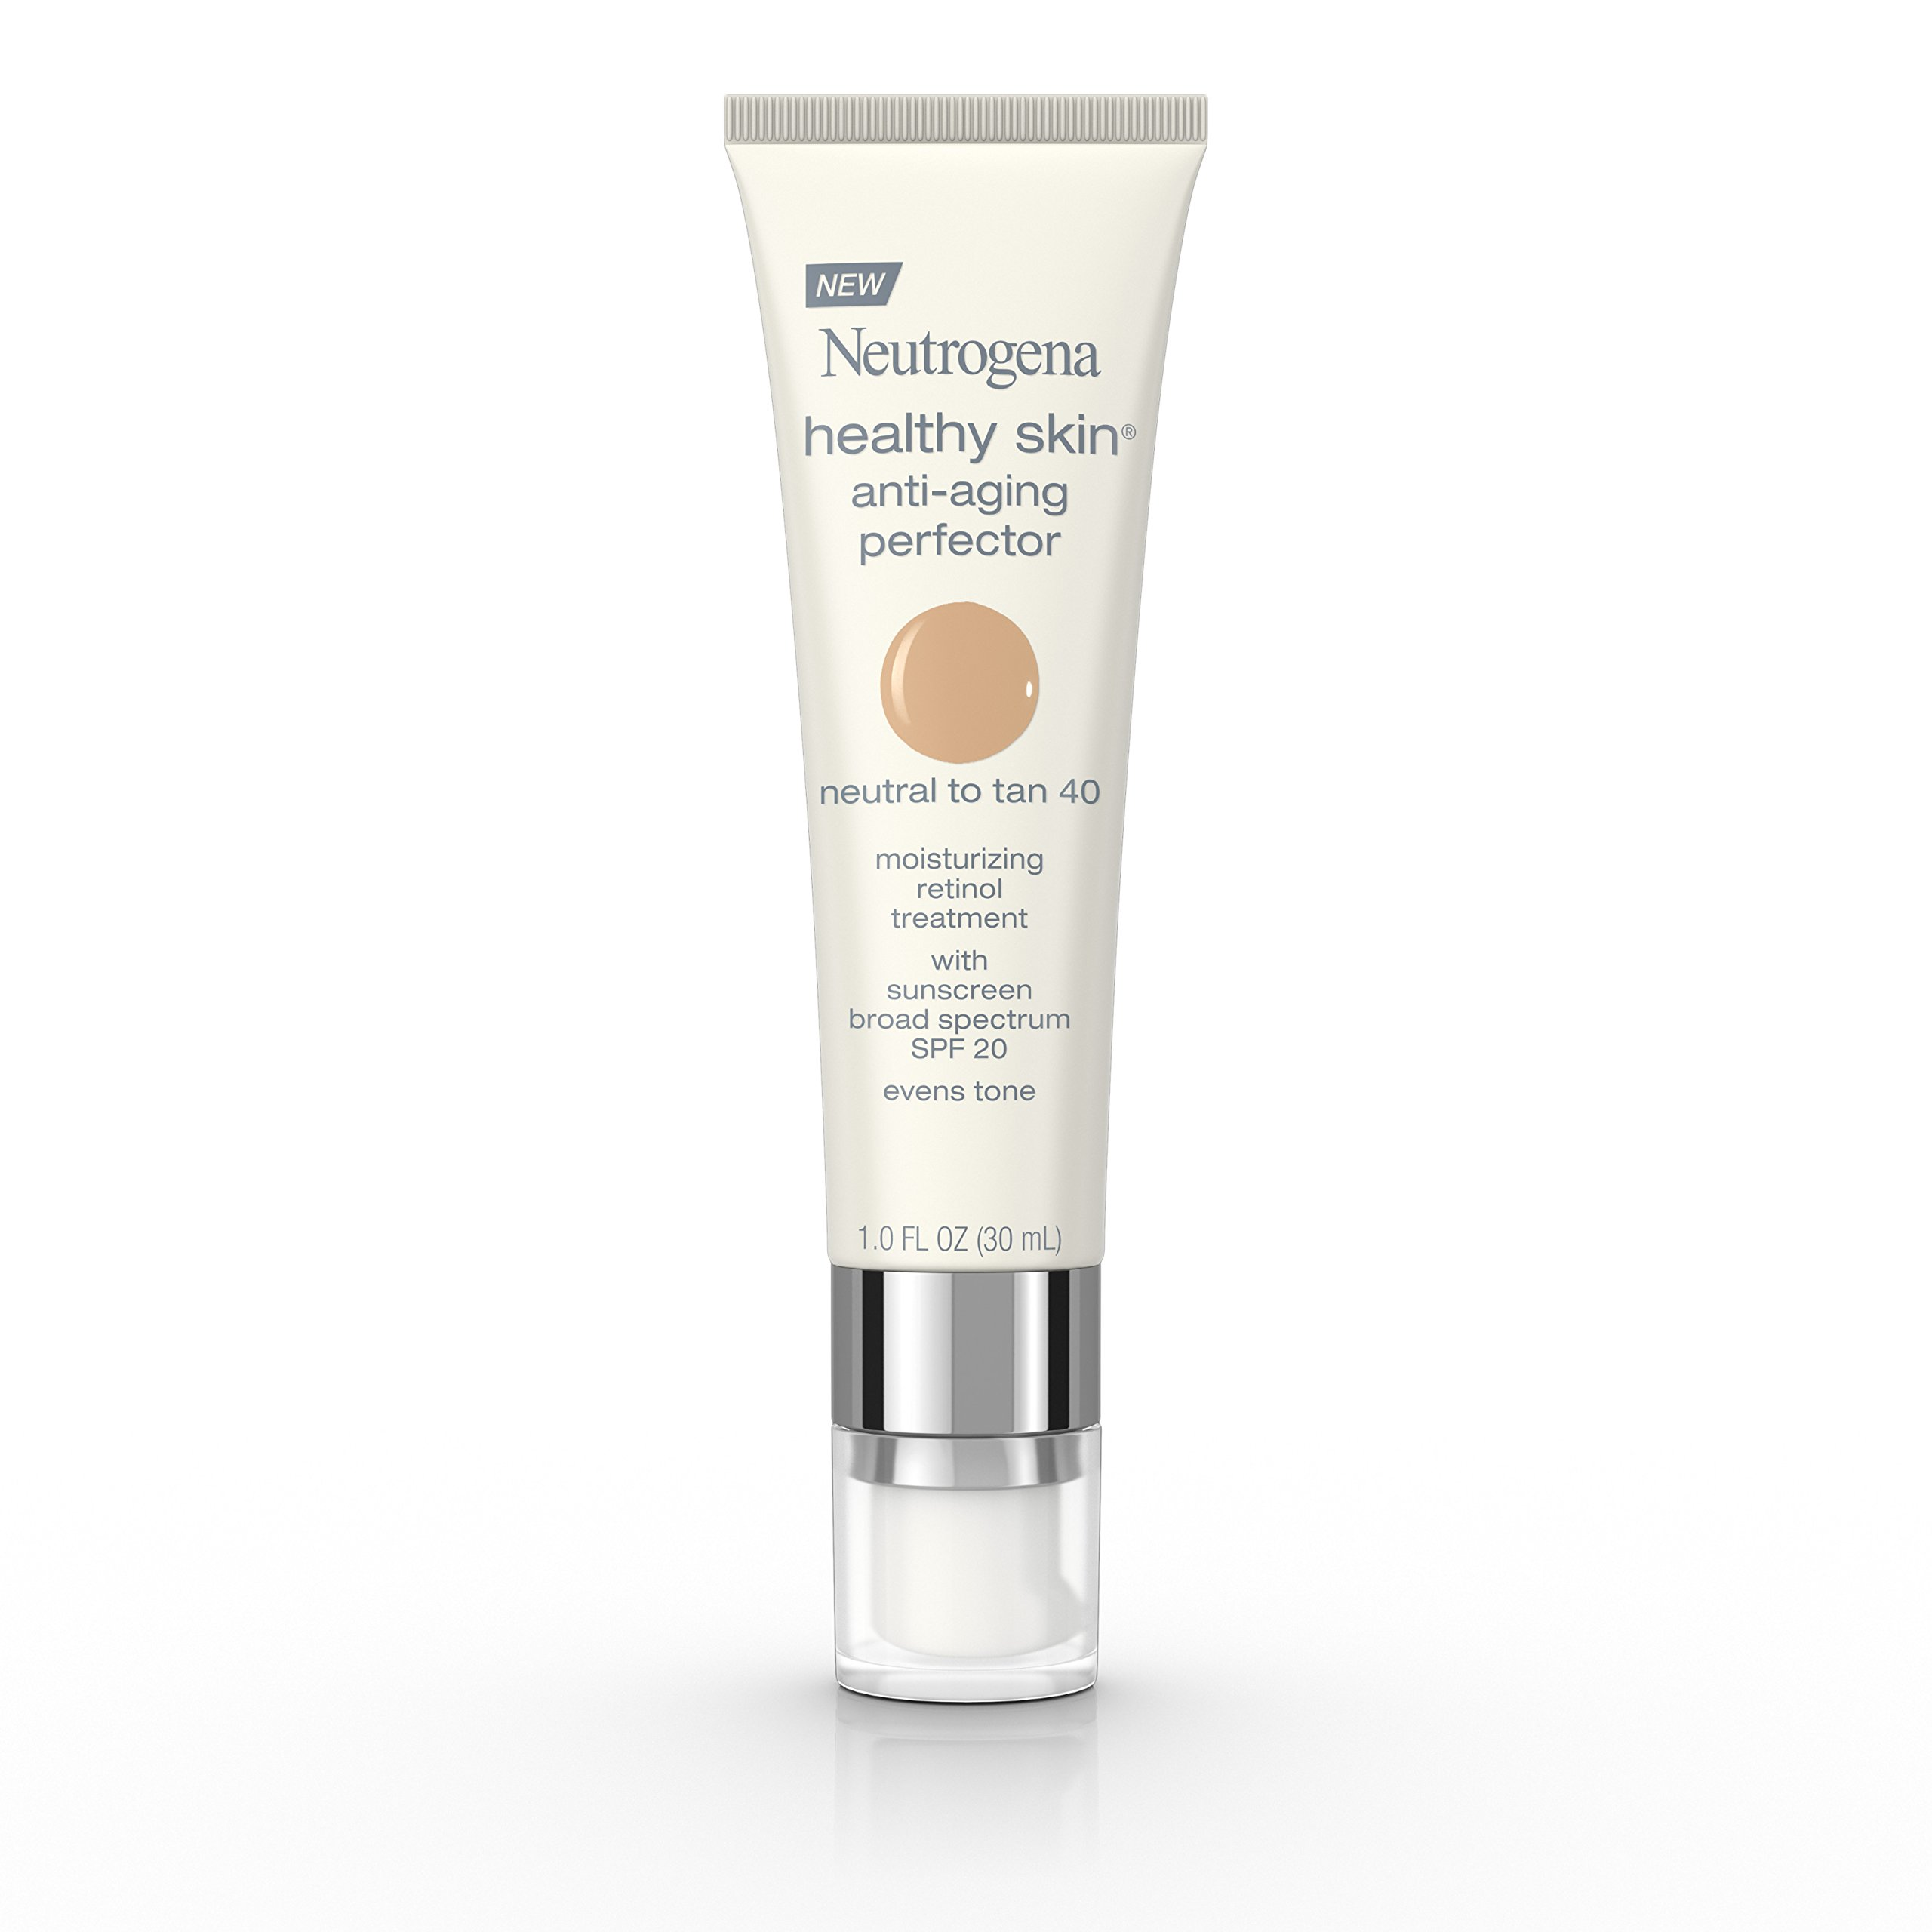 Neutrogena Healthy Skin Anti-Aging Perfector Spf 20, Retinol Treatment, 40 Neutral To